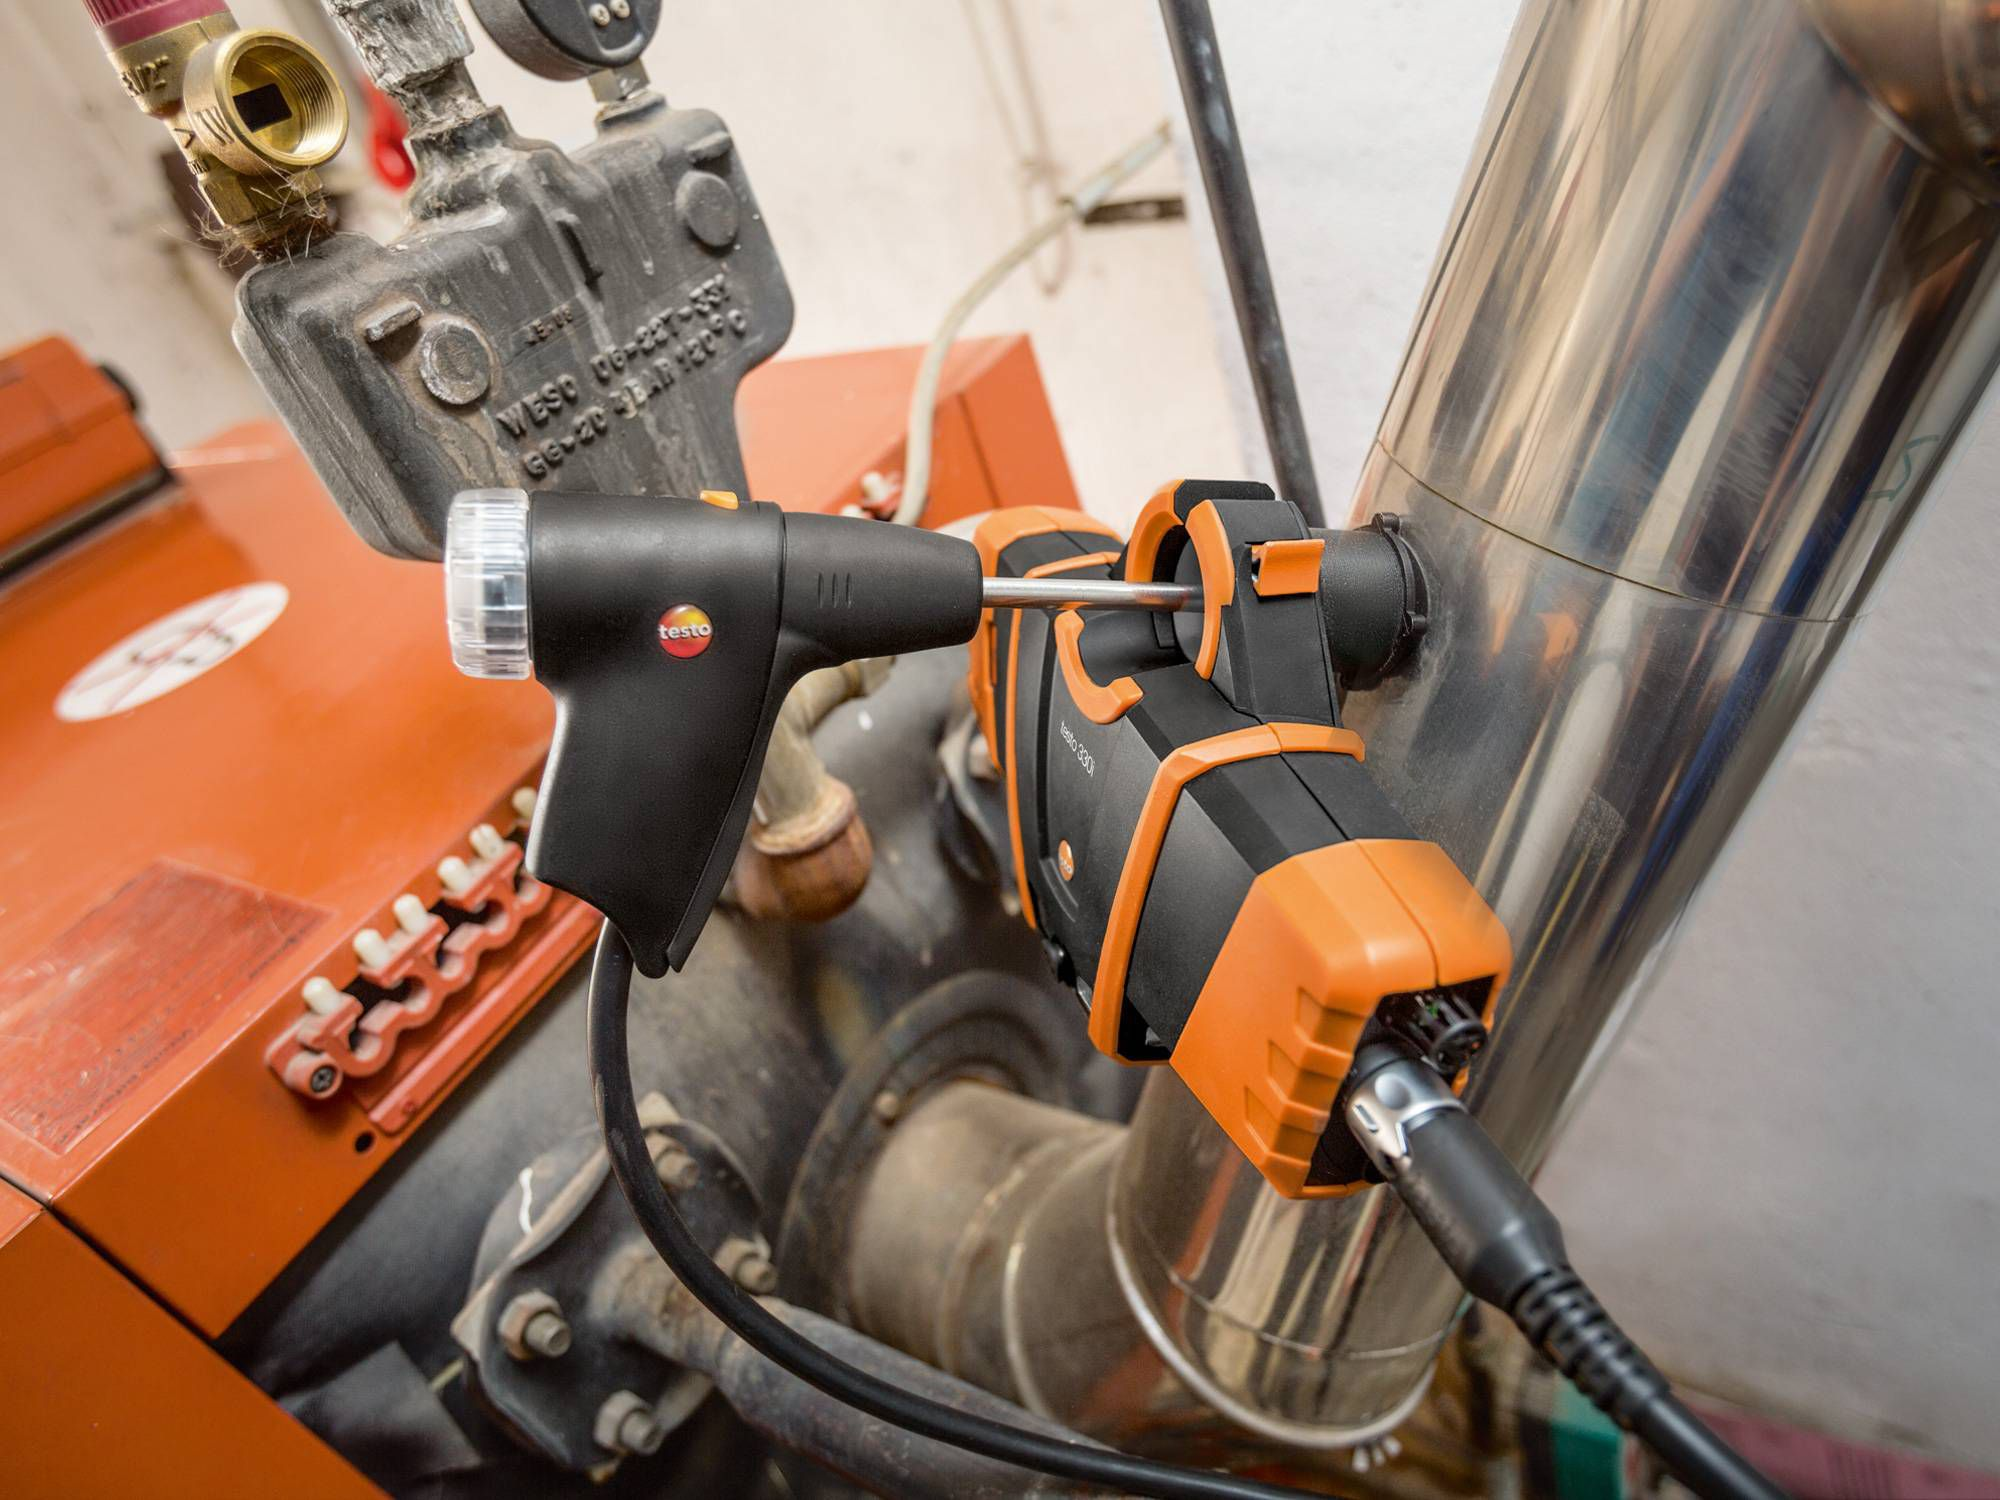 Testo analiza ispušnih plinova